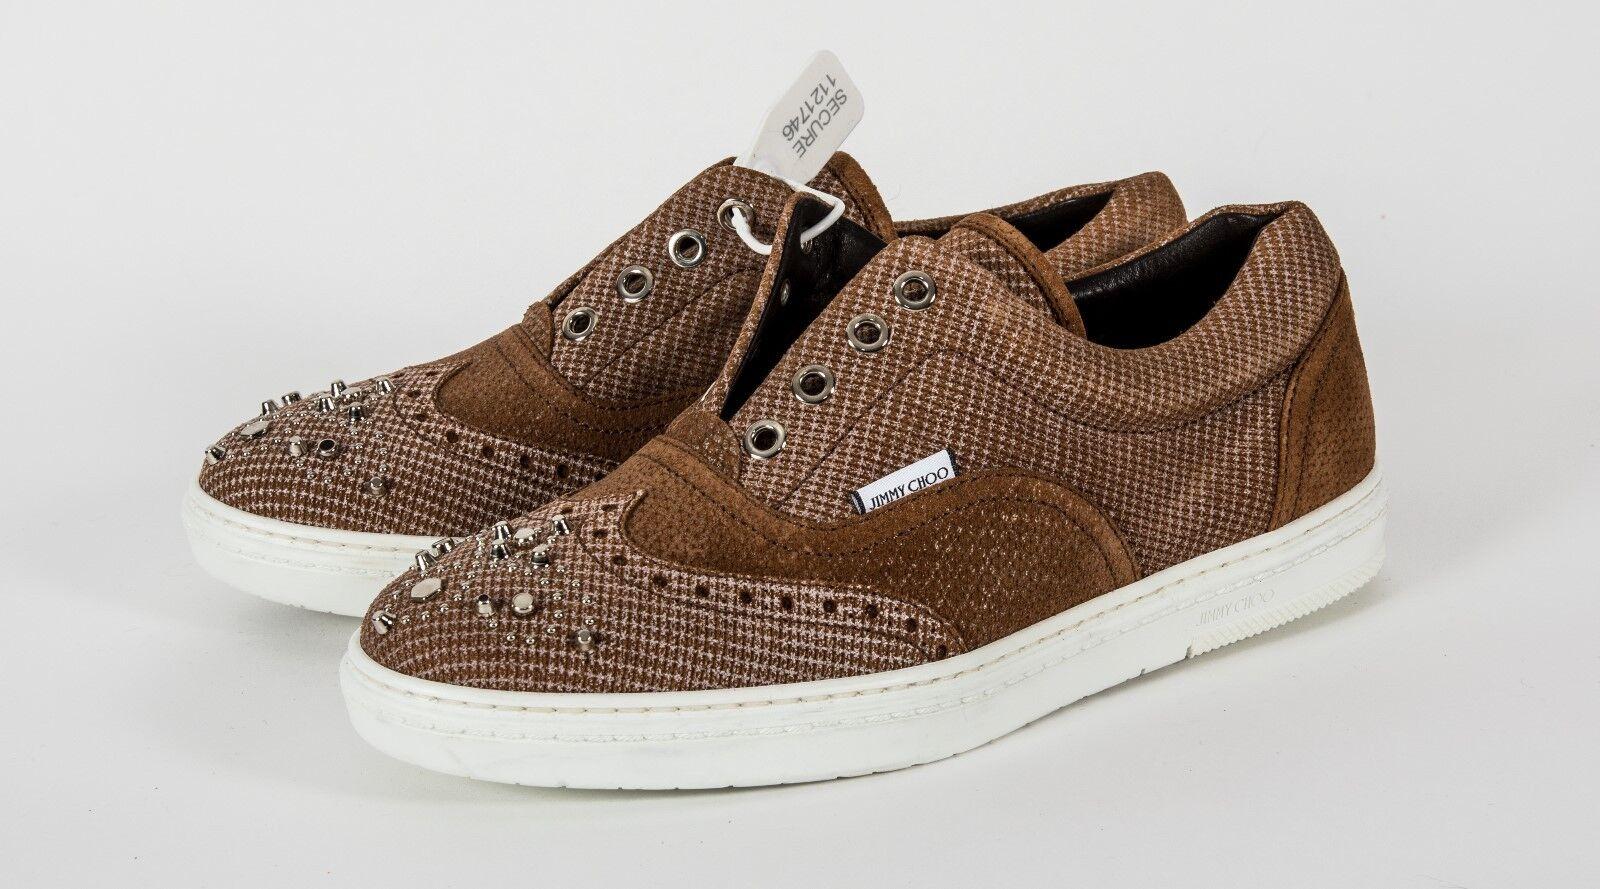 Scarpe casual da uomo  Jimmy Choo Brian Nude slip on shoes sneakers w/ studs size 39